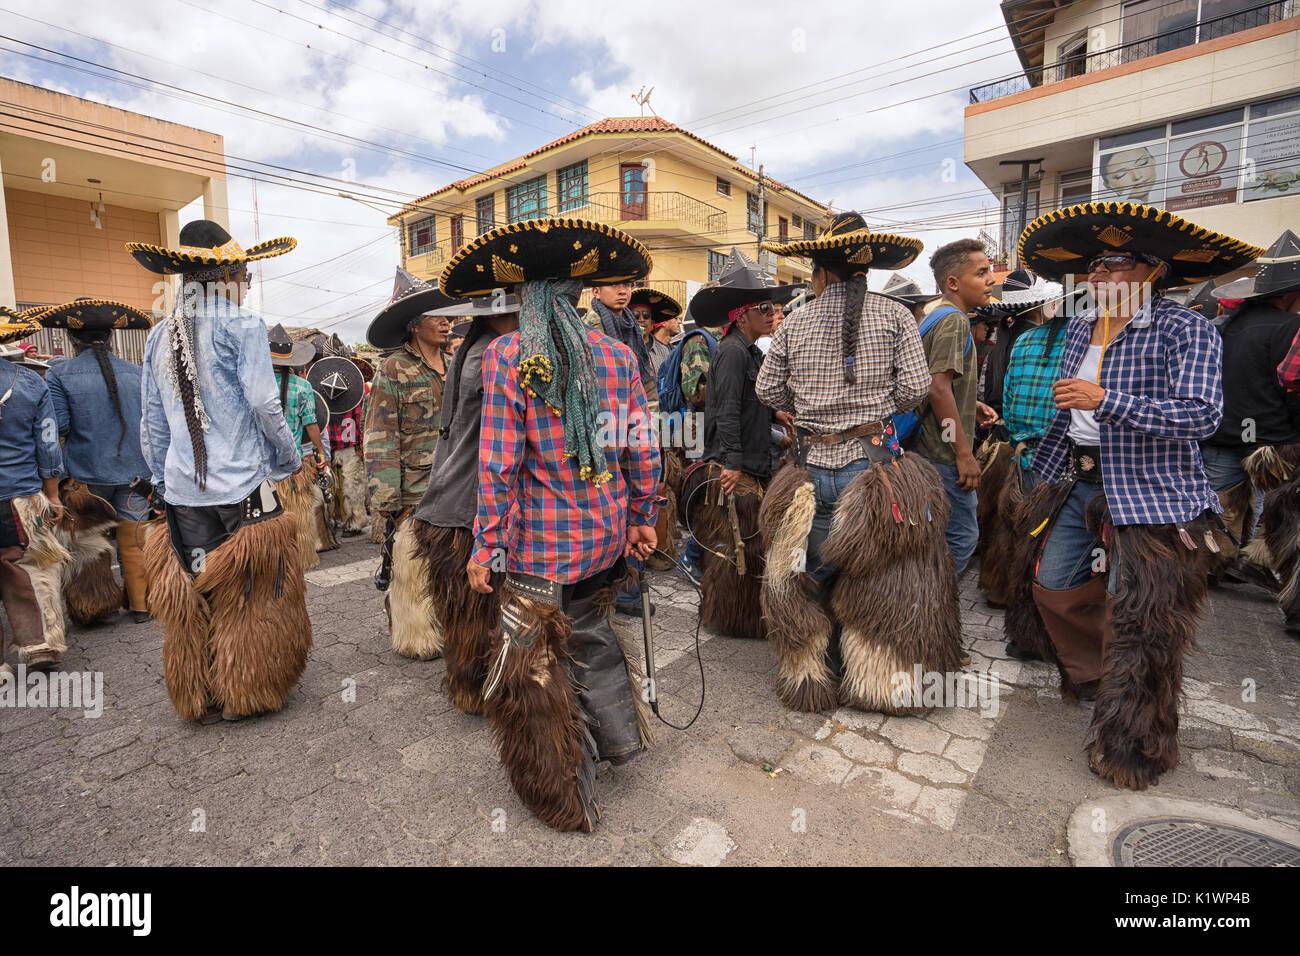 June 24, 2017 Cotacachi, Ecuador: dancing indigenous kichwa men at the Inti Raymi parade at summer solstice - Stock Image